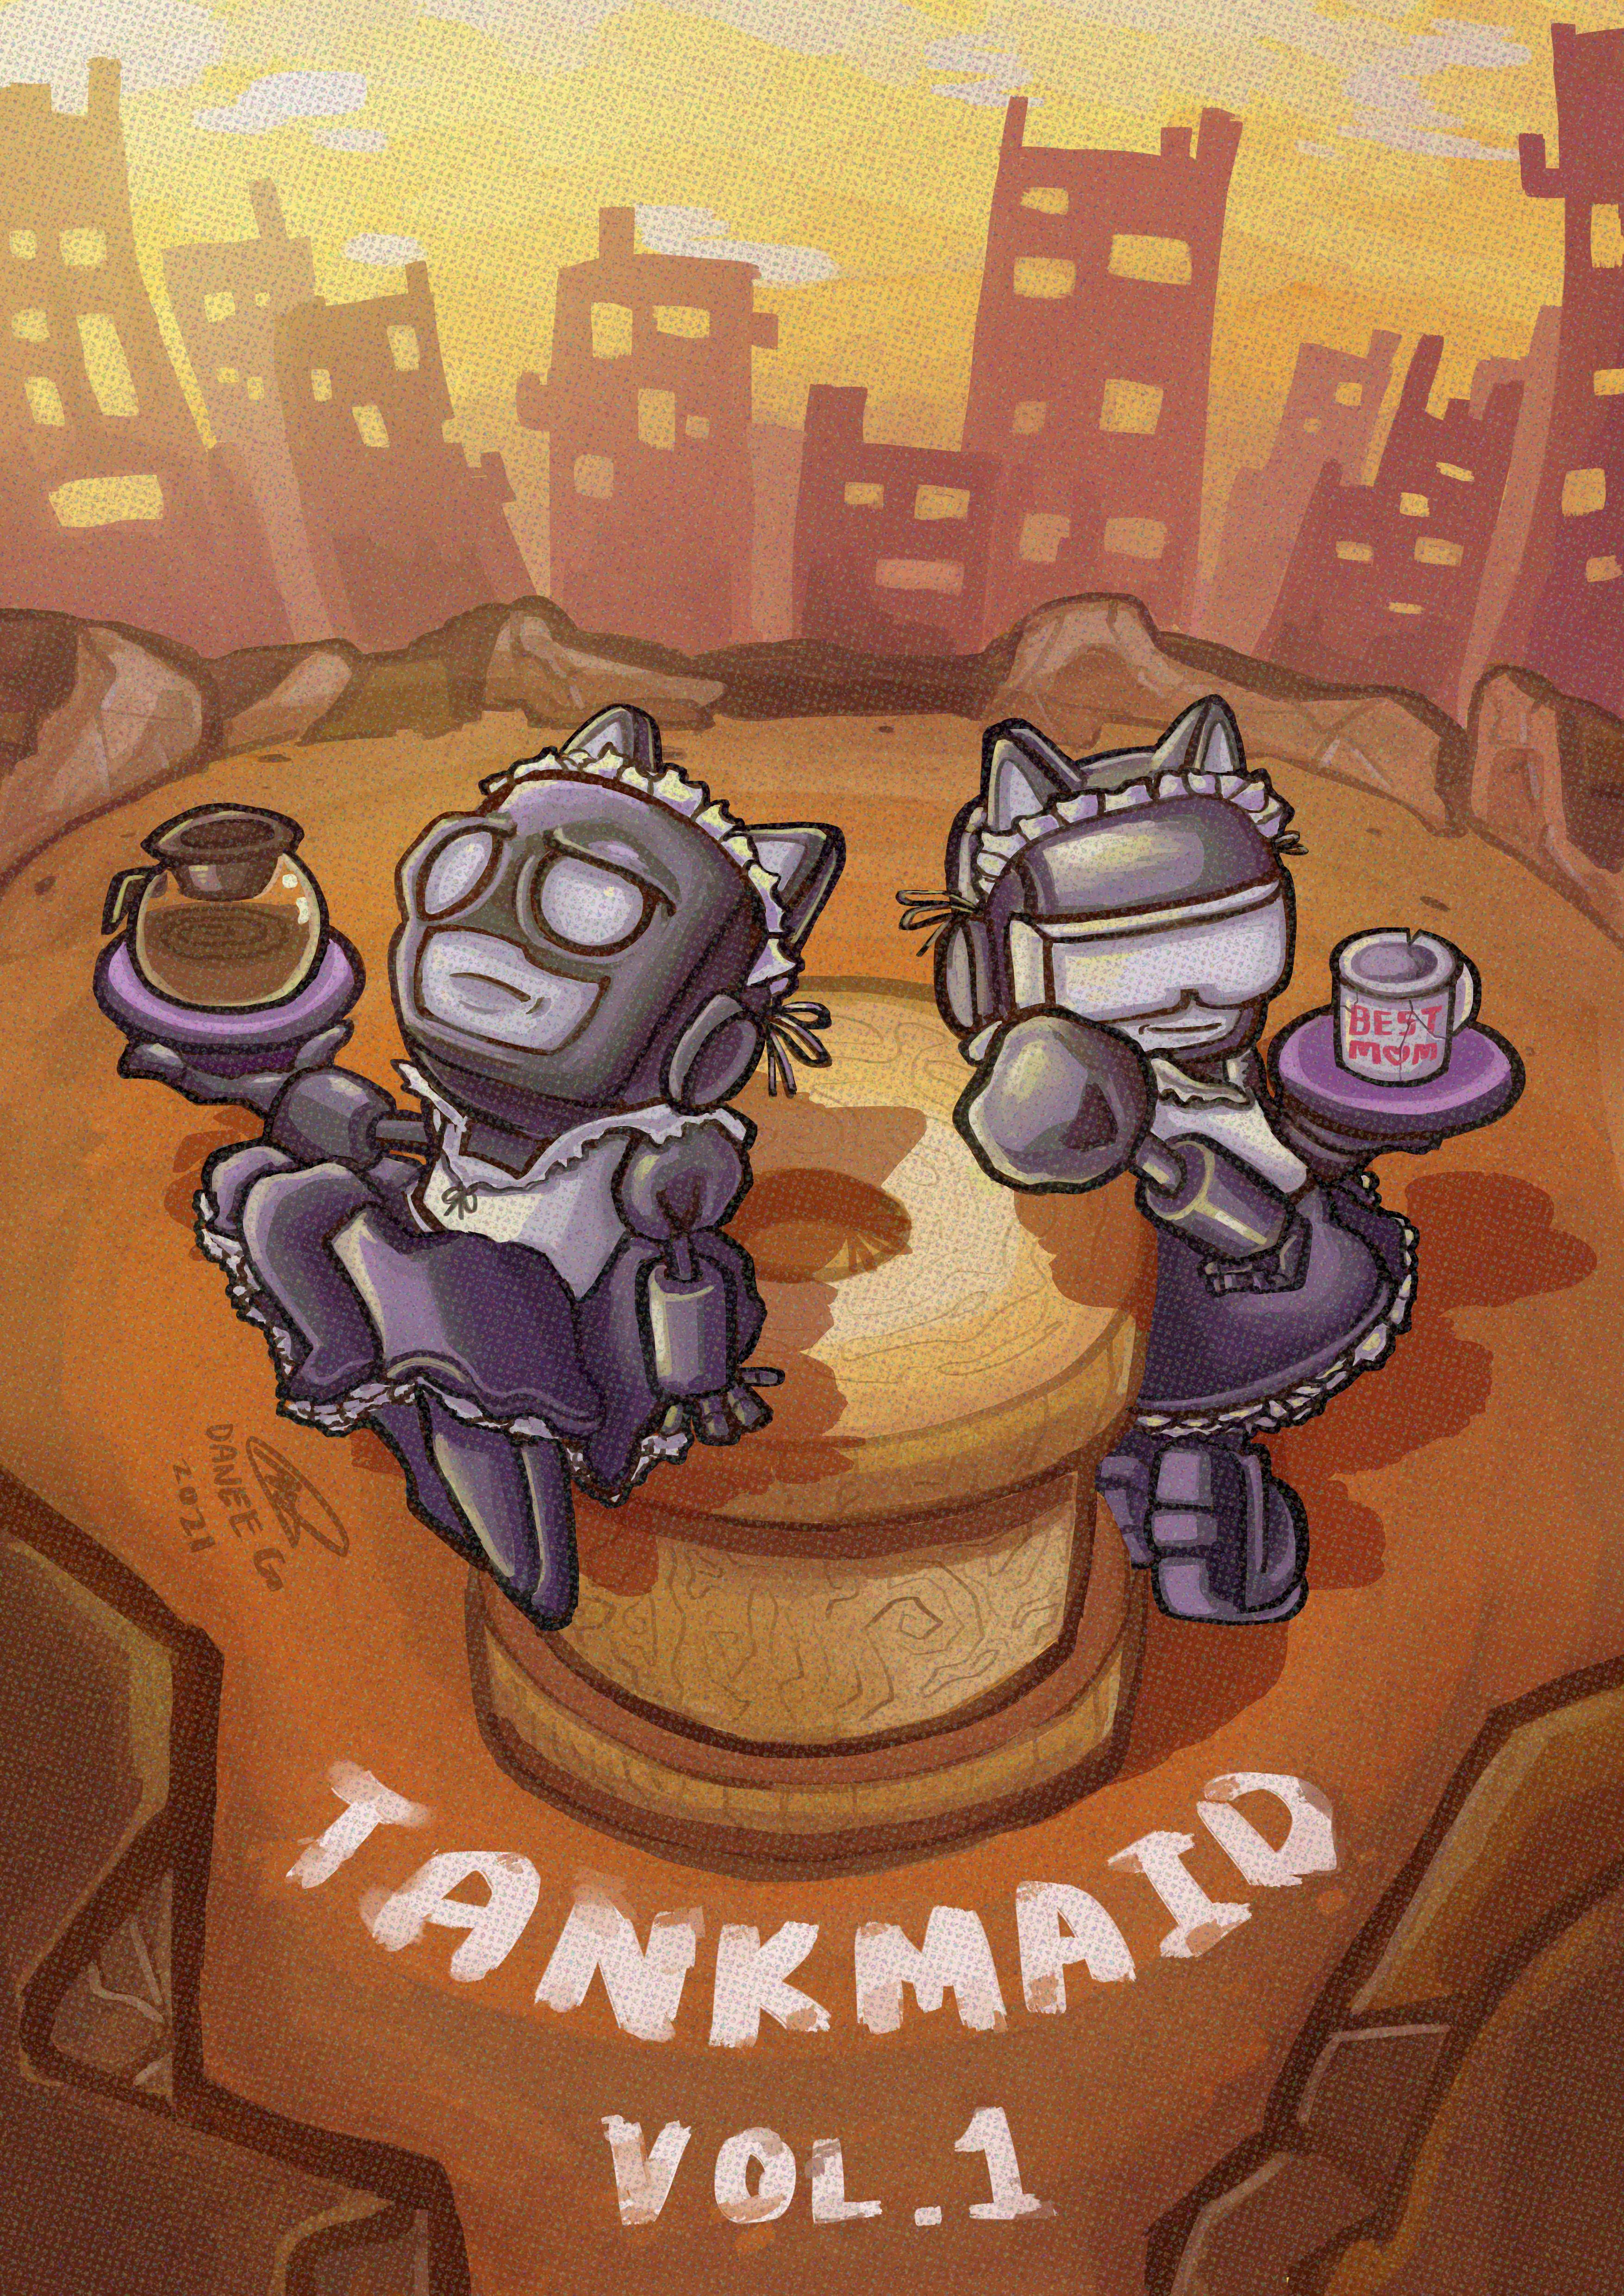 Tankmaid Poster